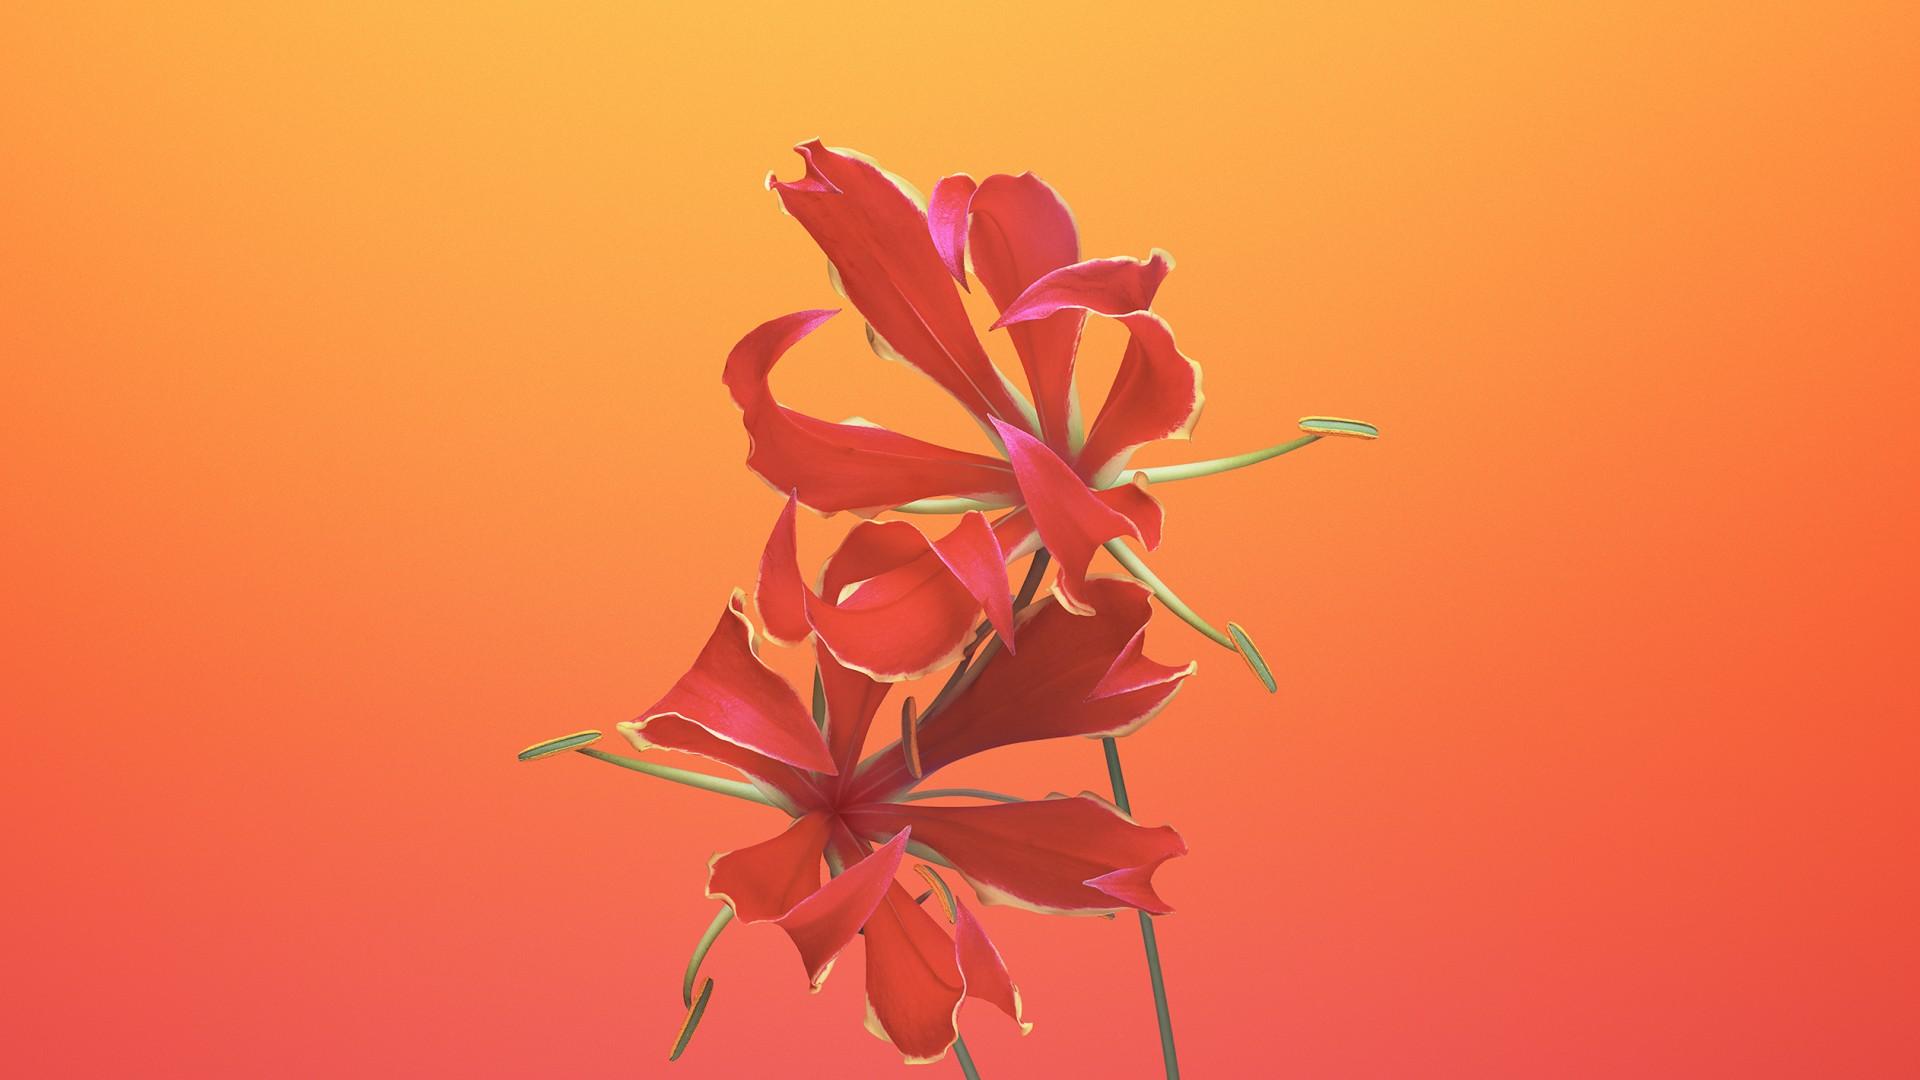 Wallpaper Iphone X Wallpapers Iphone 8 Ios11 Flower Retina 4k